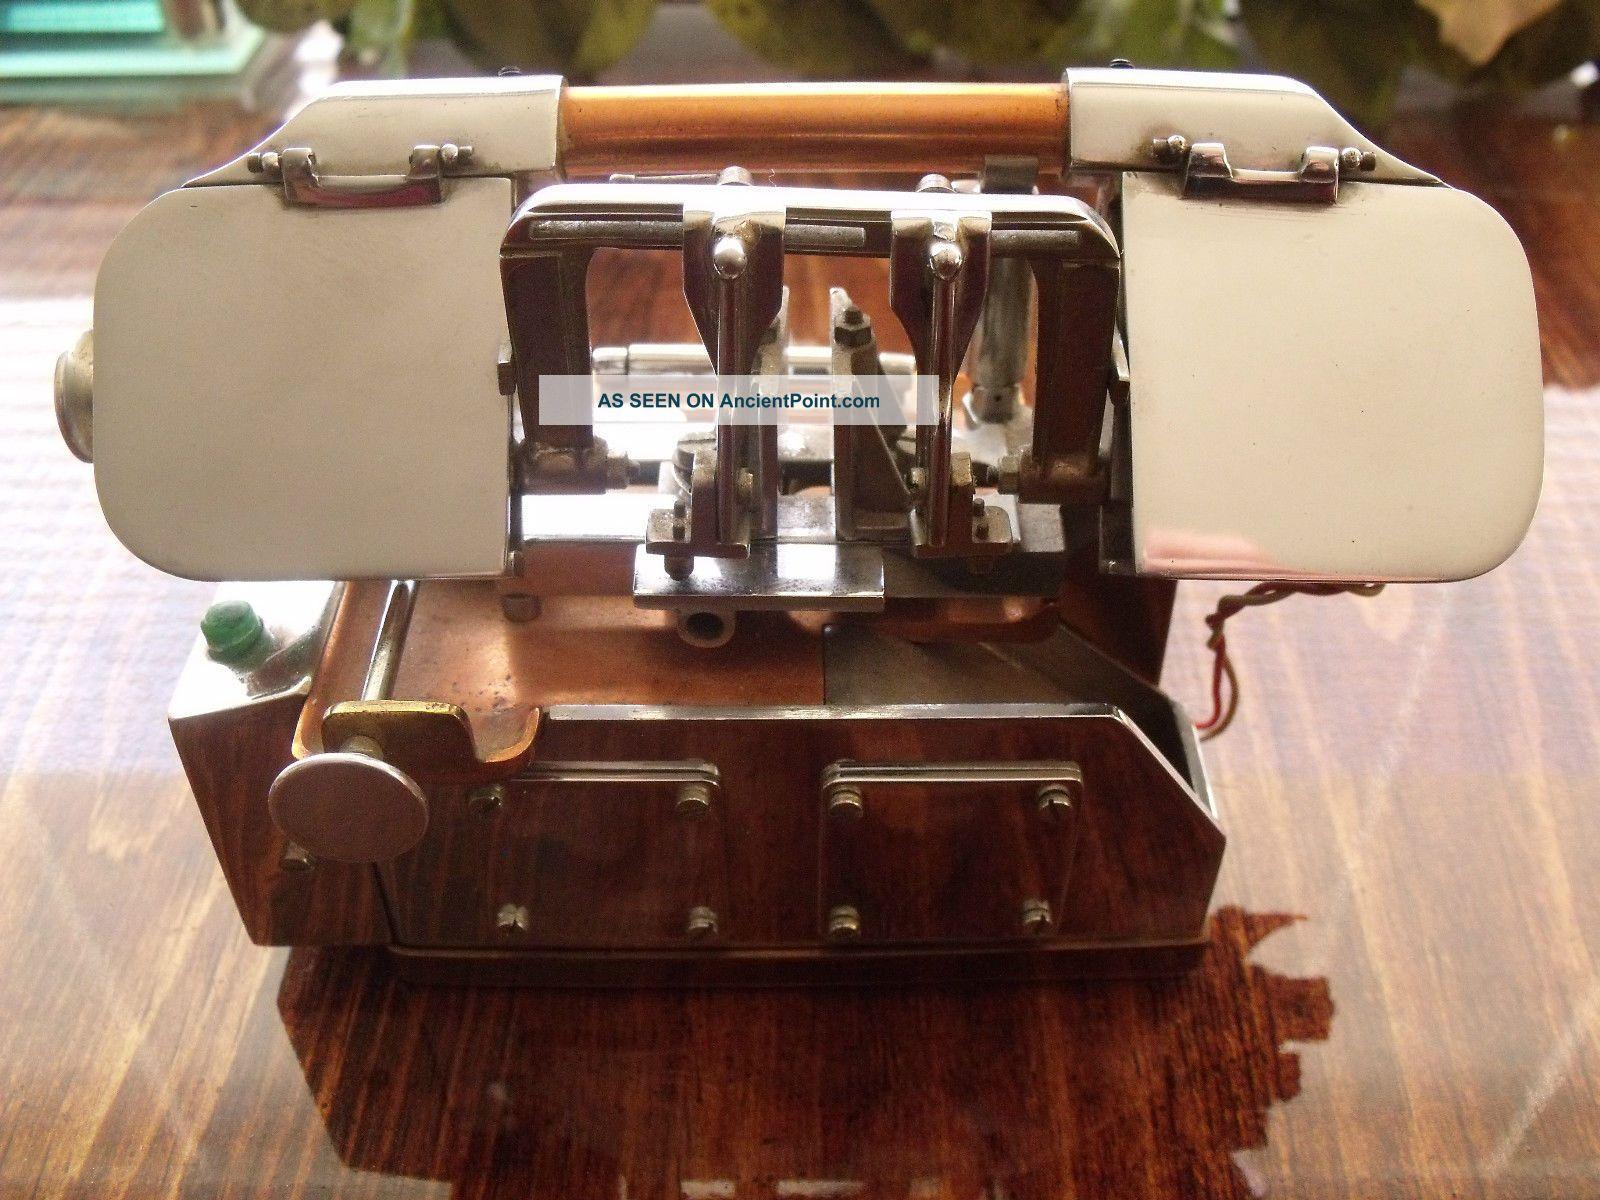 Miniature Horizontal Band Saw,  Machine Shop,  Top Craftsmanship,  Unimat,  Emco,  4